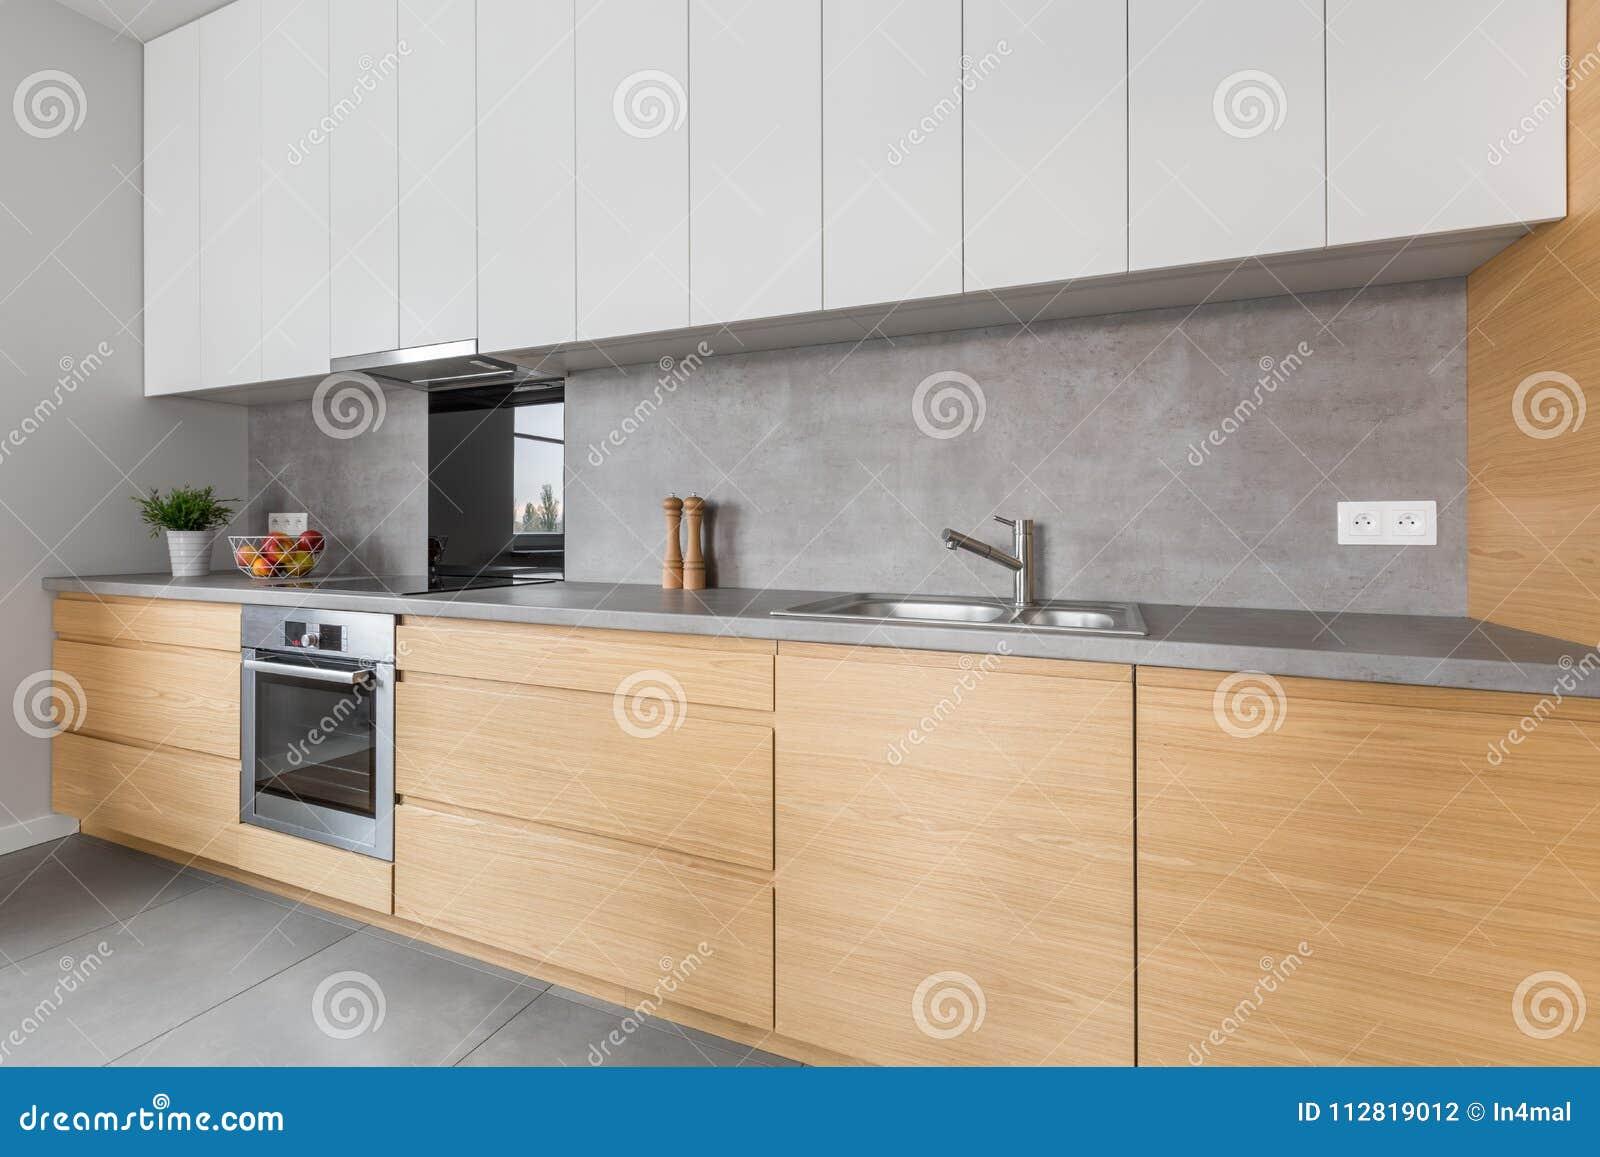 Best Kitchen Furniture Wooden Trend Gallery @house2homegoods.net